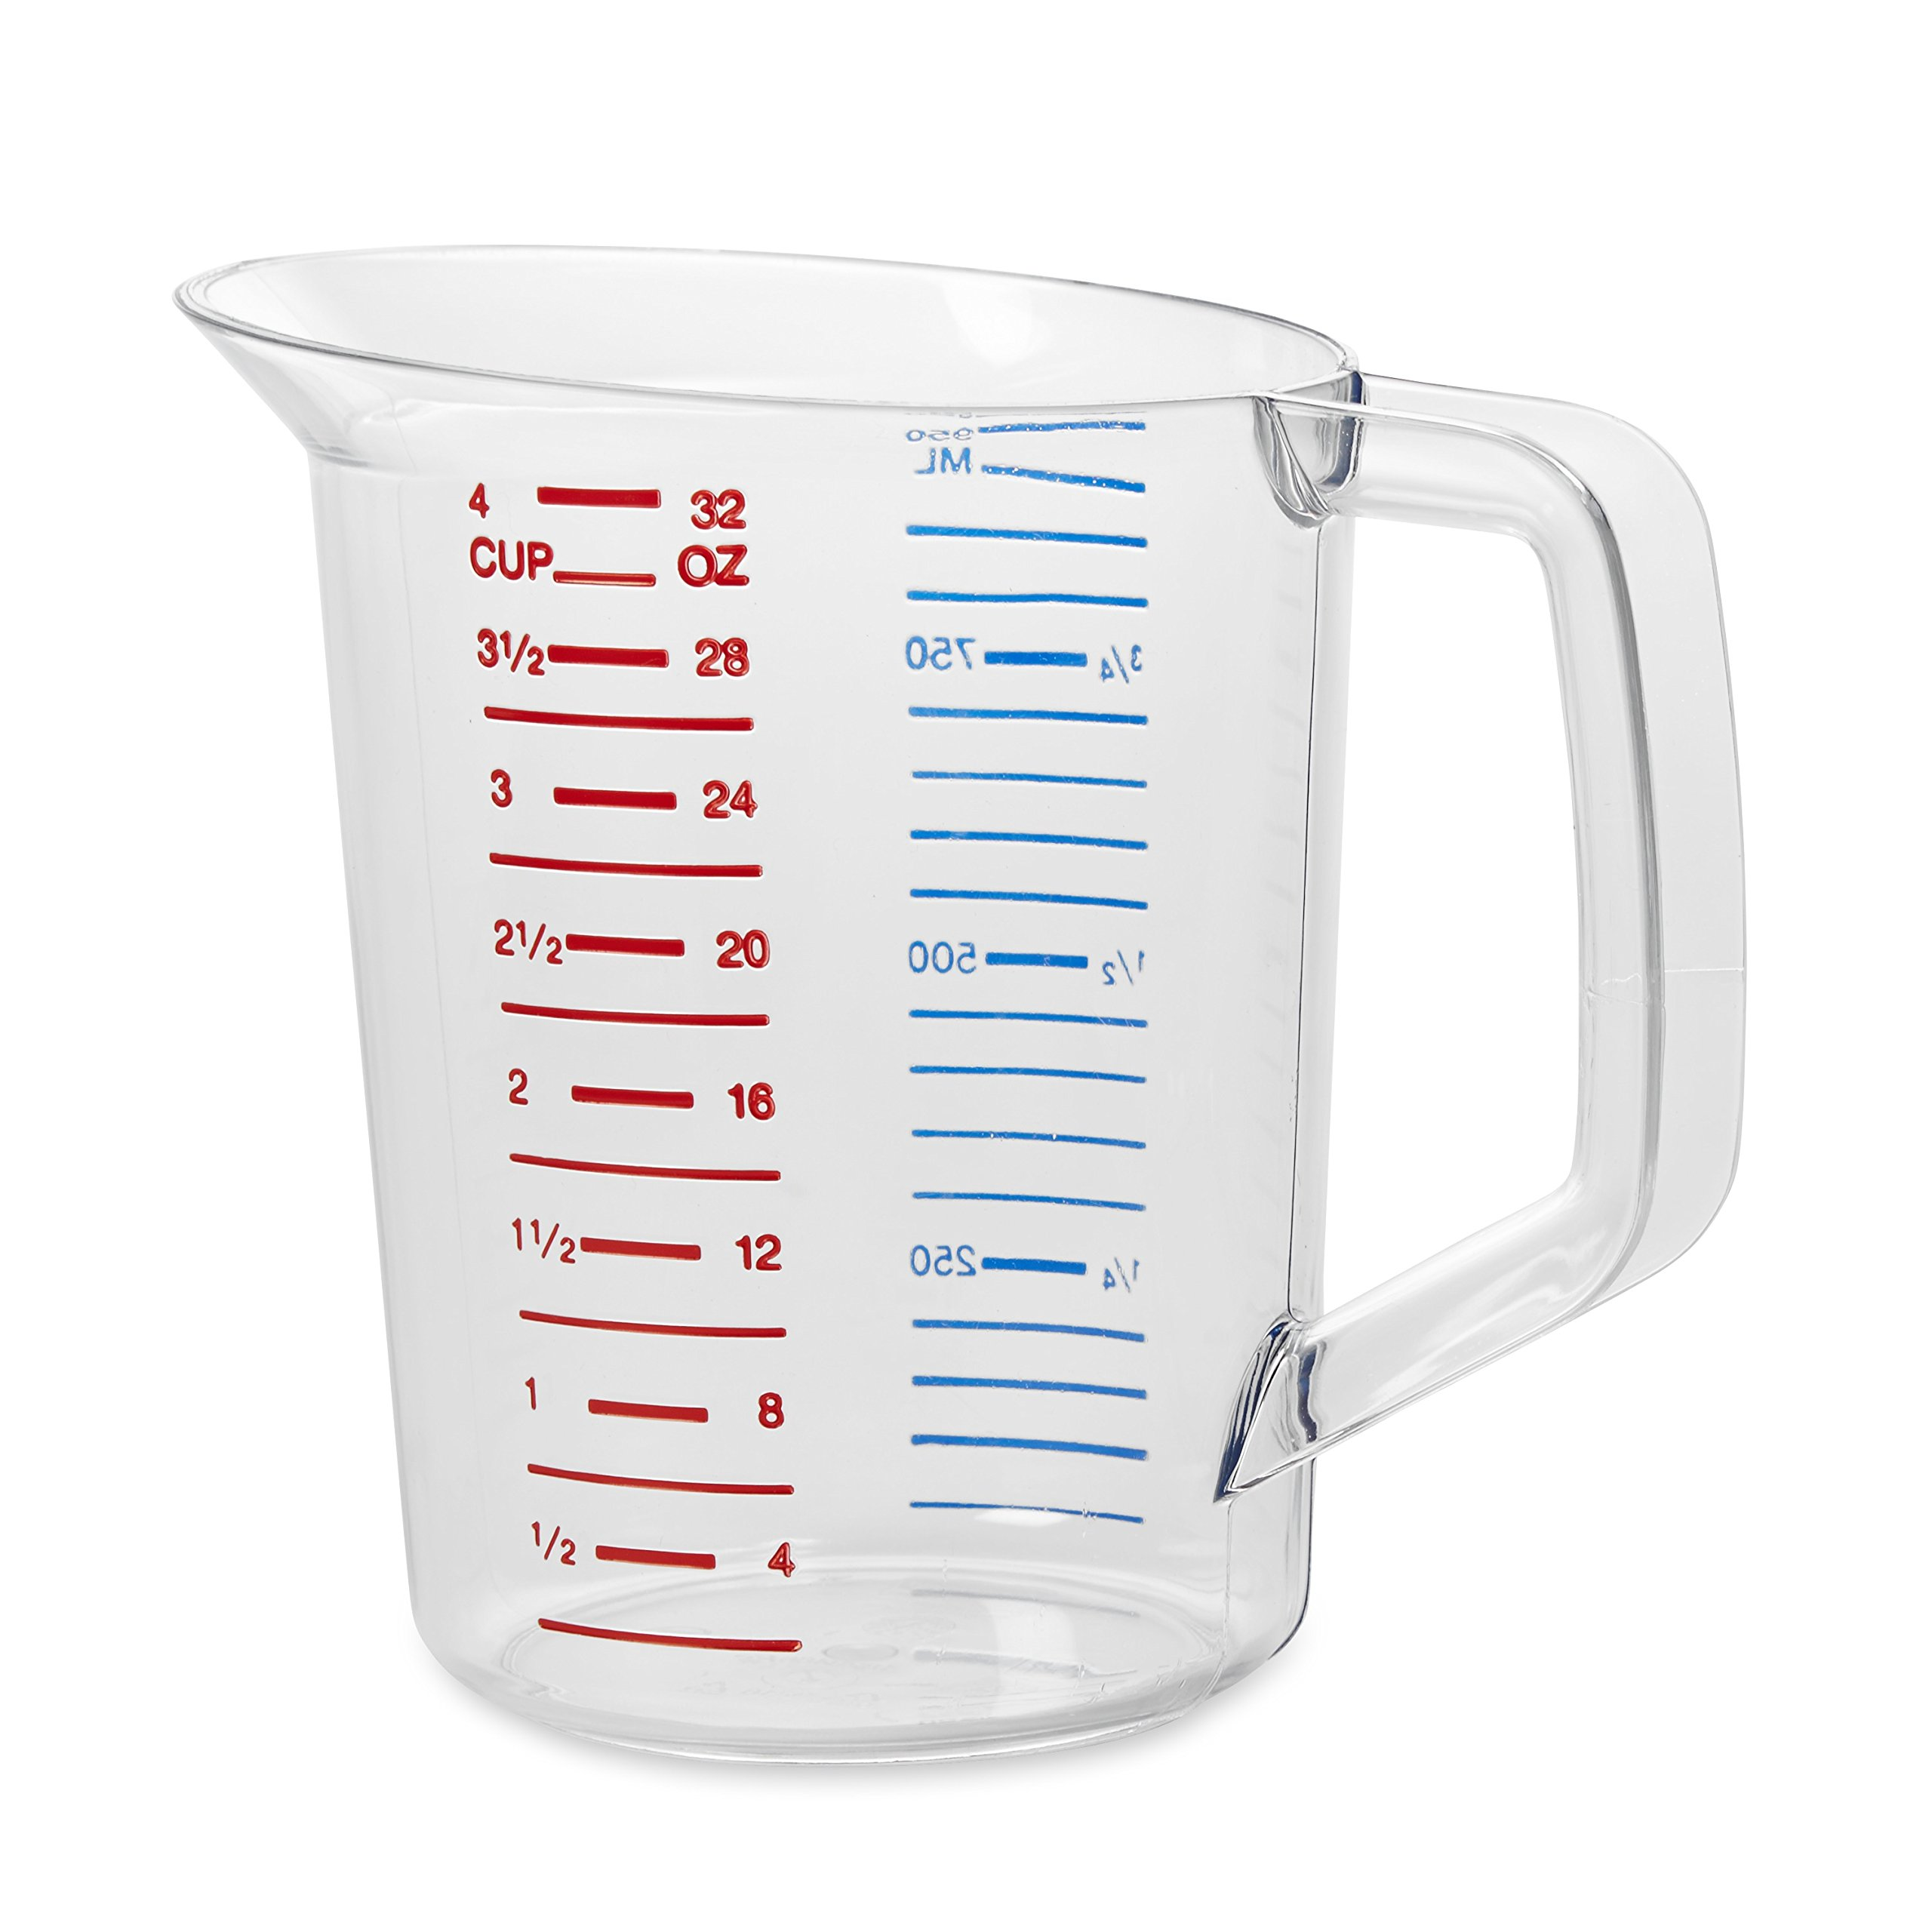 Rubbermaid Commercial Bouncer Measuring Cup, 1-Quart, Clear, FG321600CLR